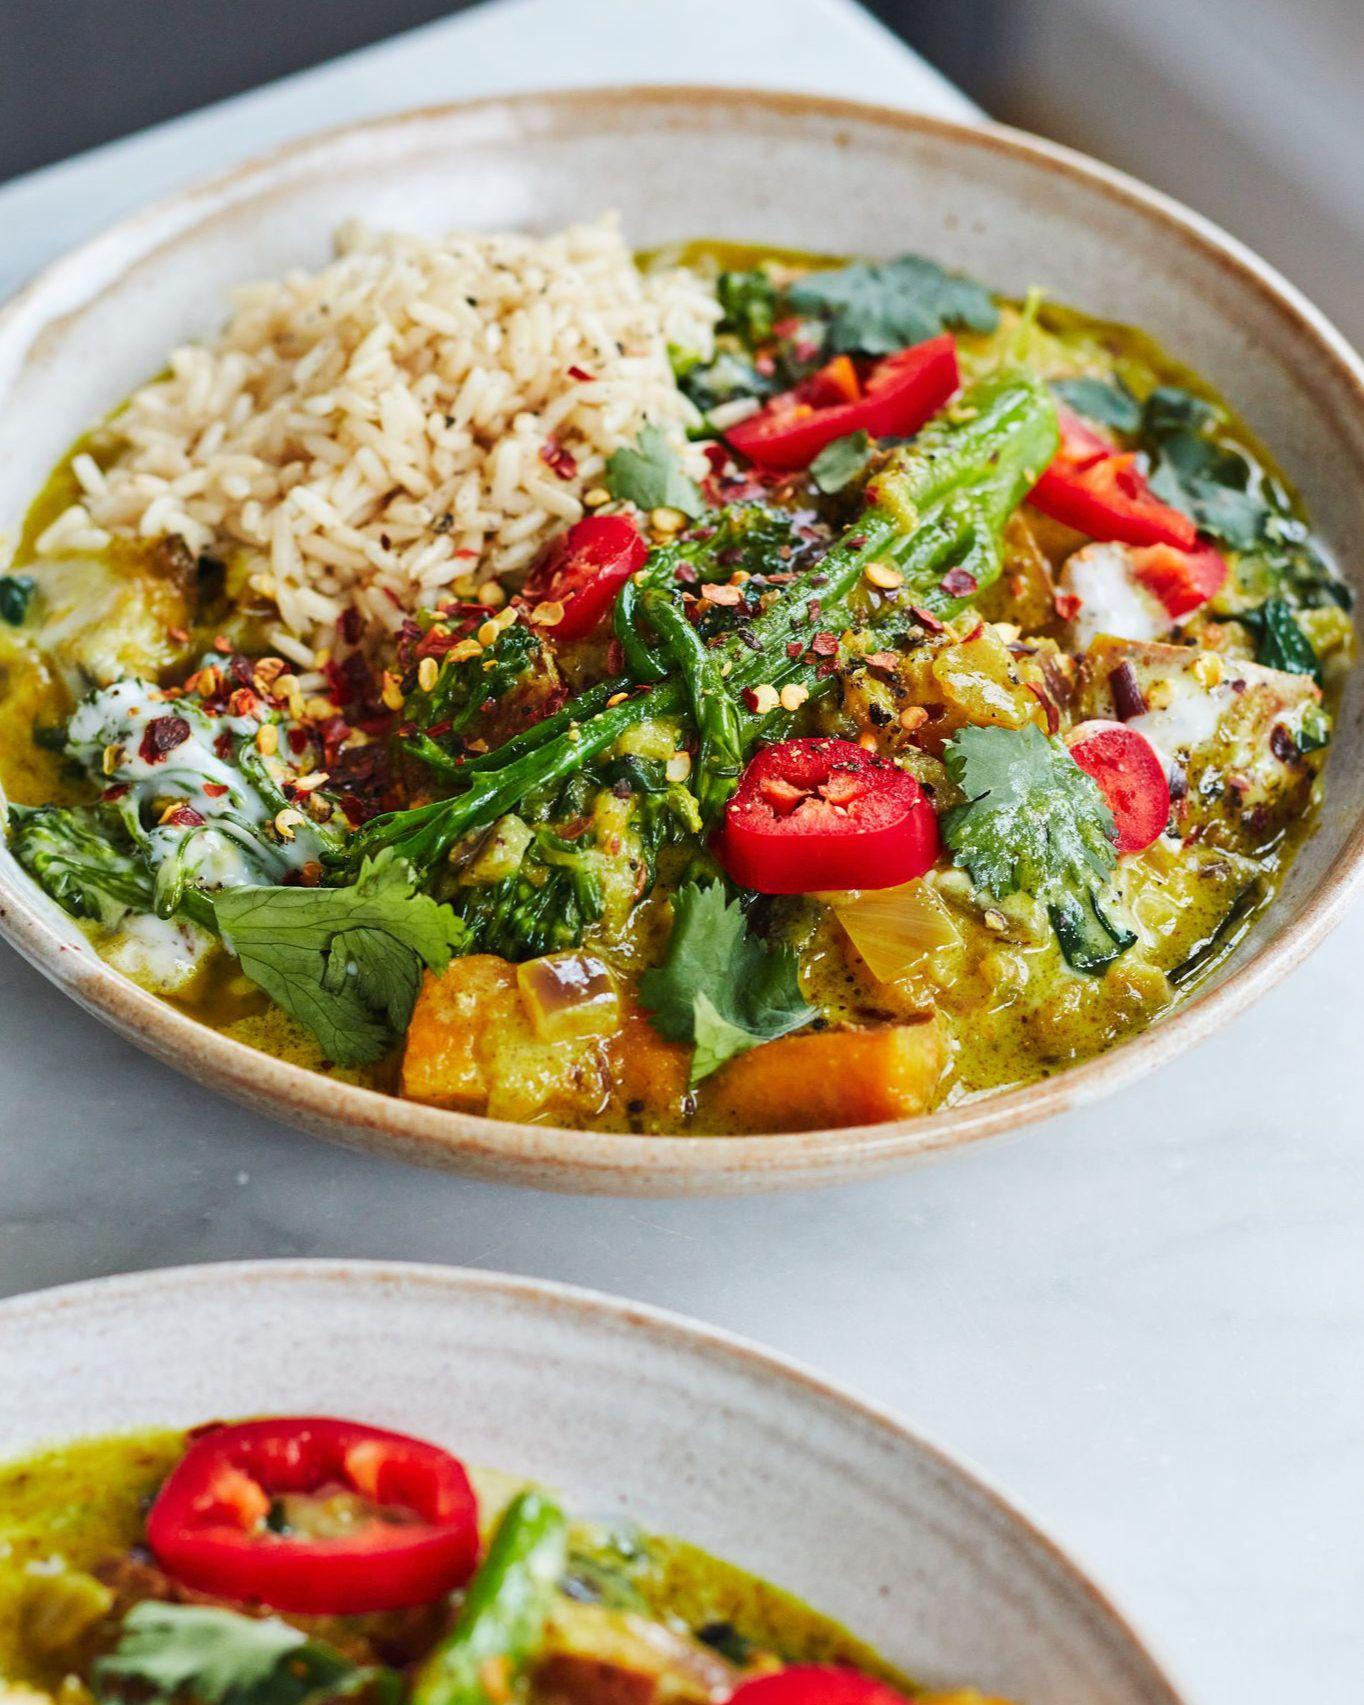 Vegan Aubergine Sweet Potato And Broccoli Curry In 2021 Vegetarian Recipes Deliciously Ella Recipes Broccoli Curry